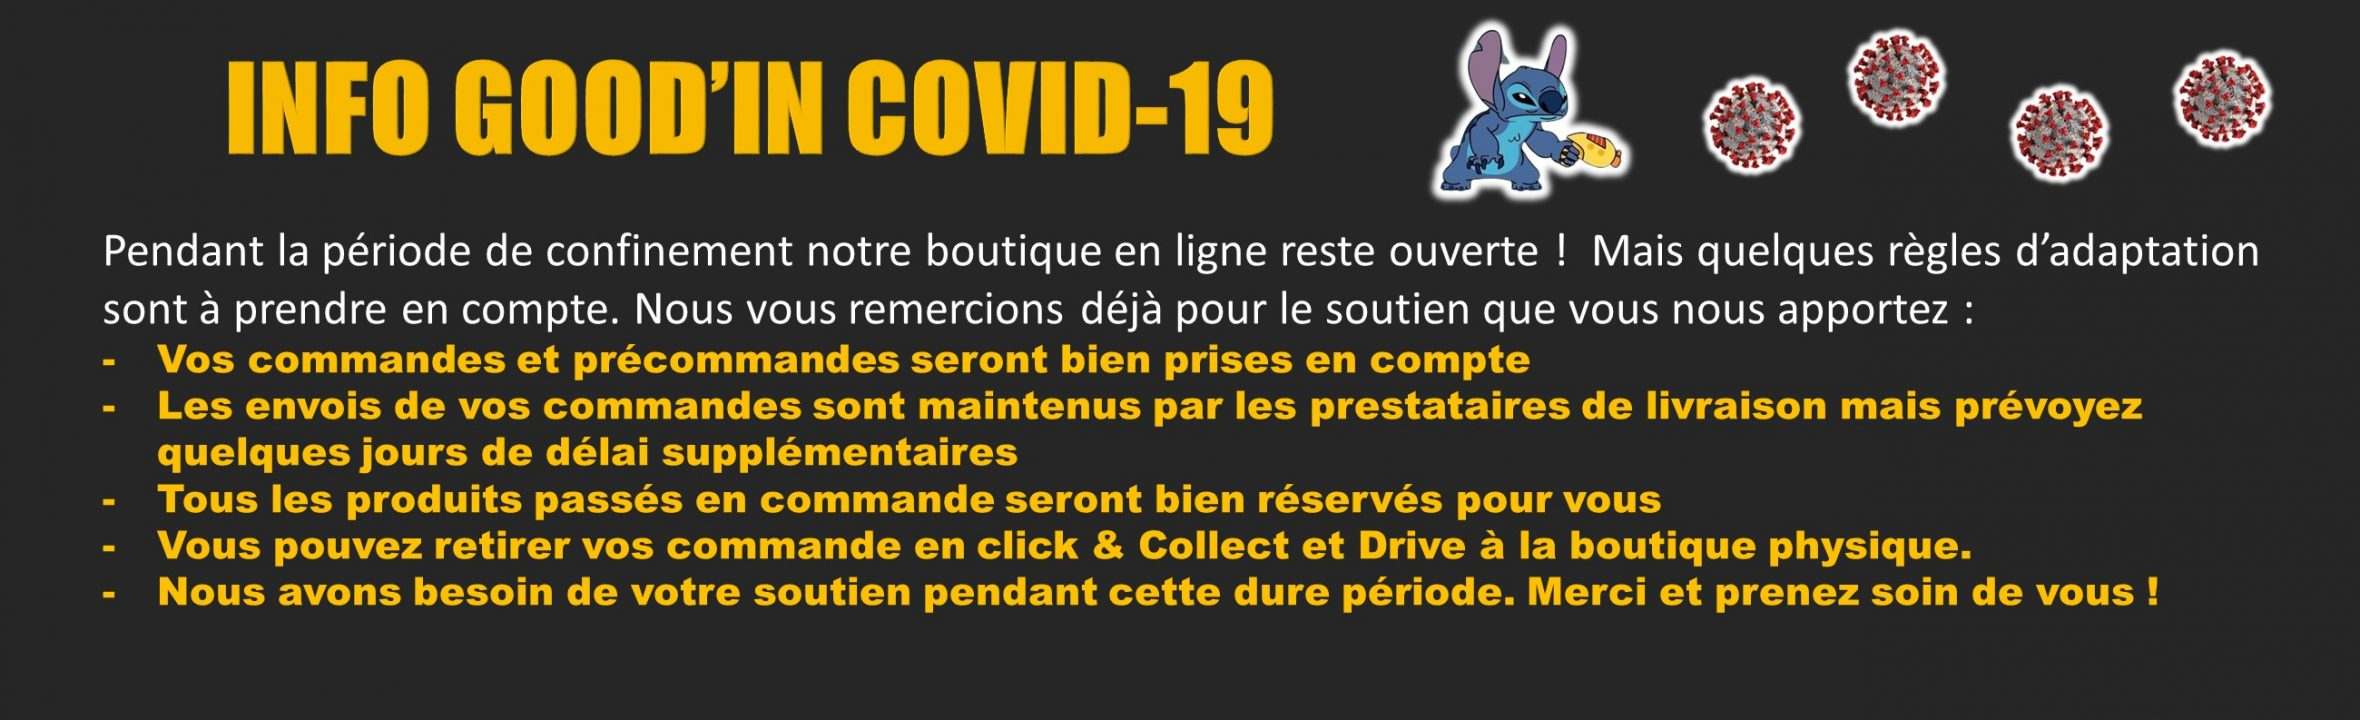 informations confinement Covid19 goodin shop